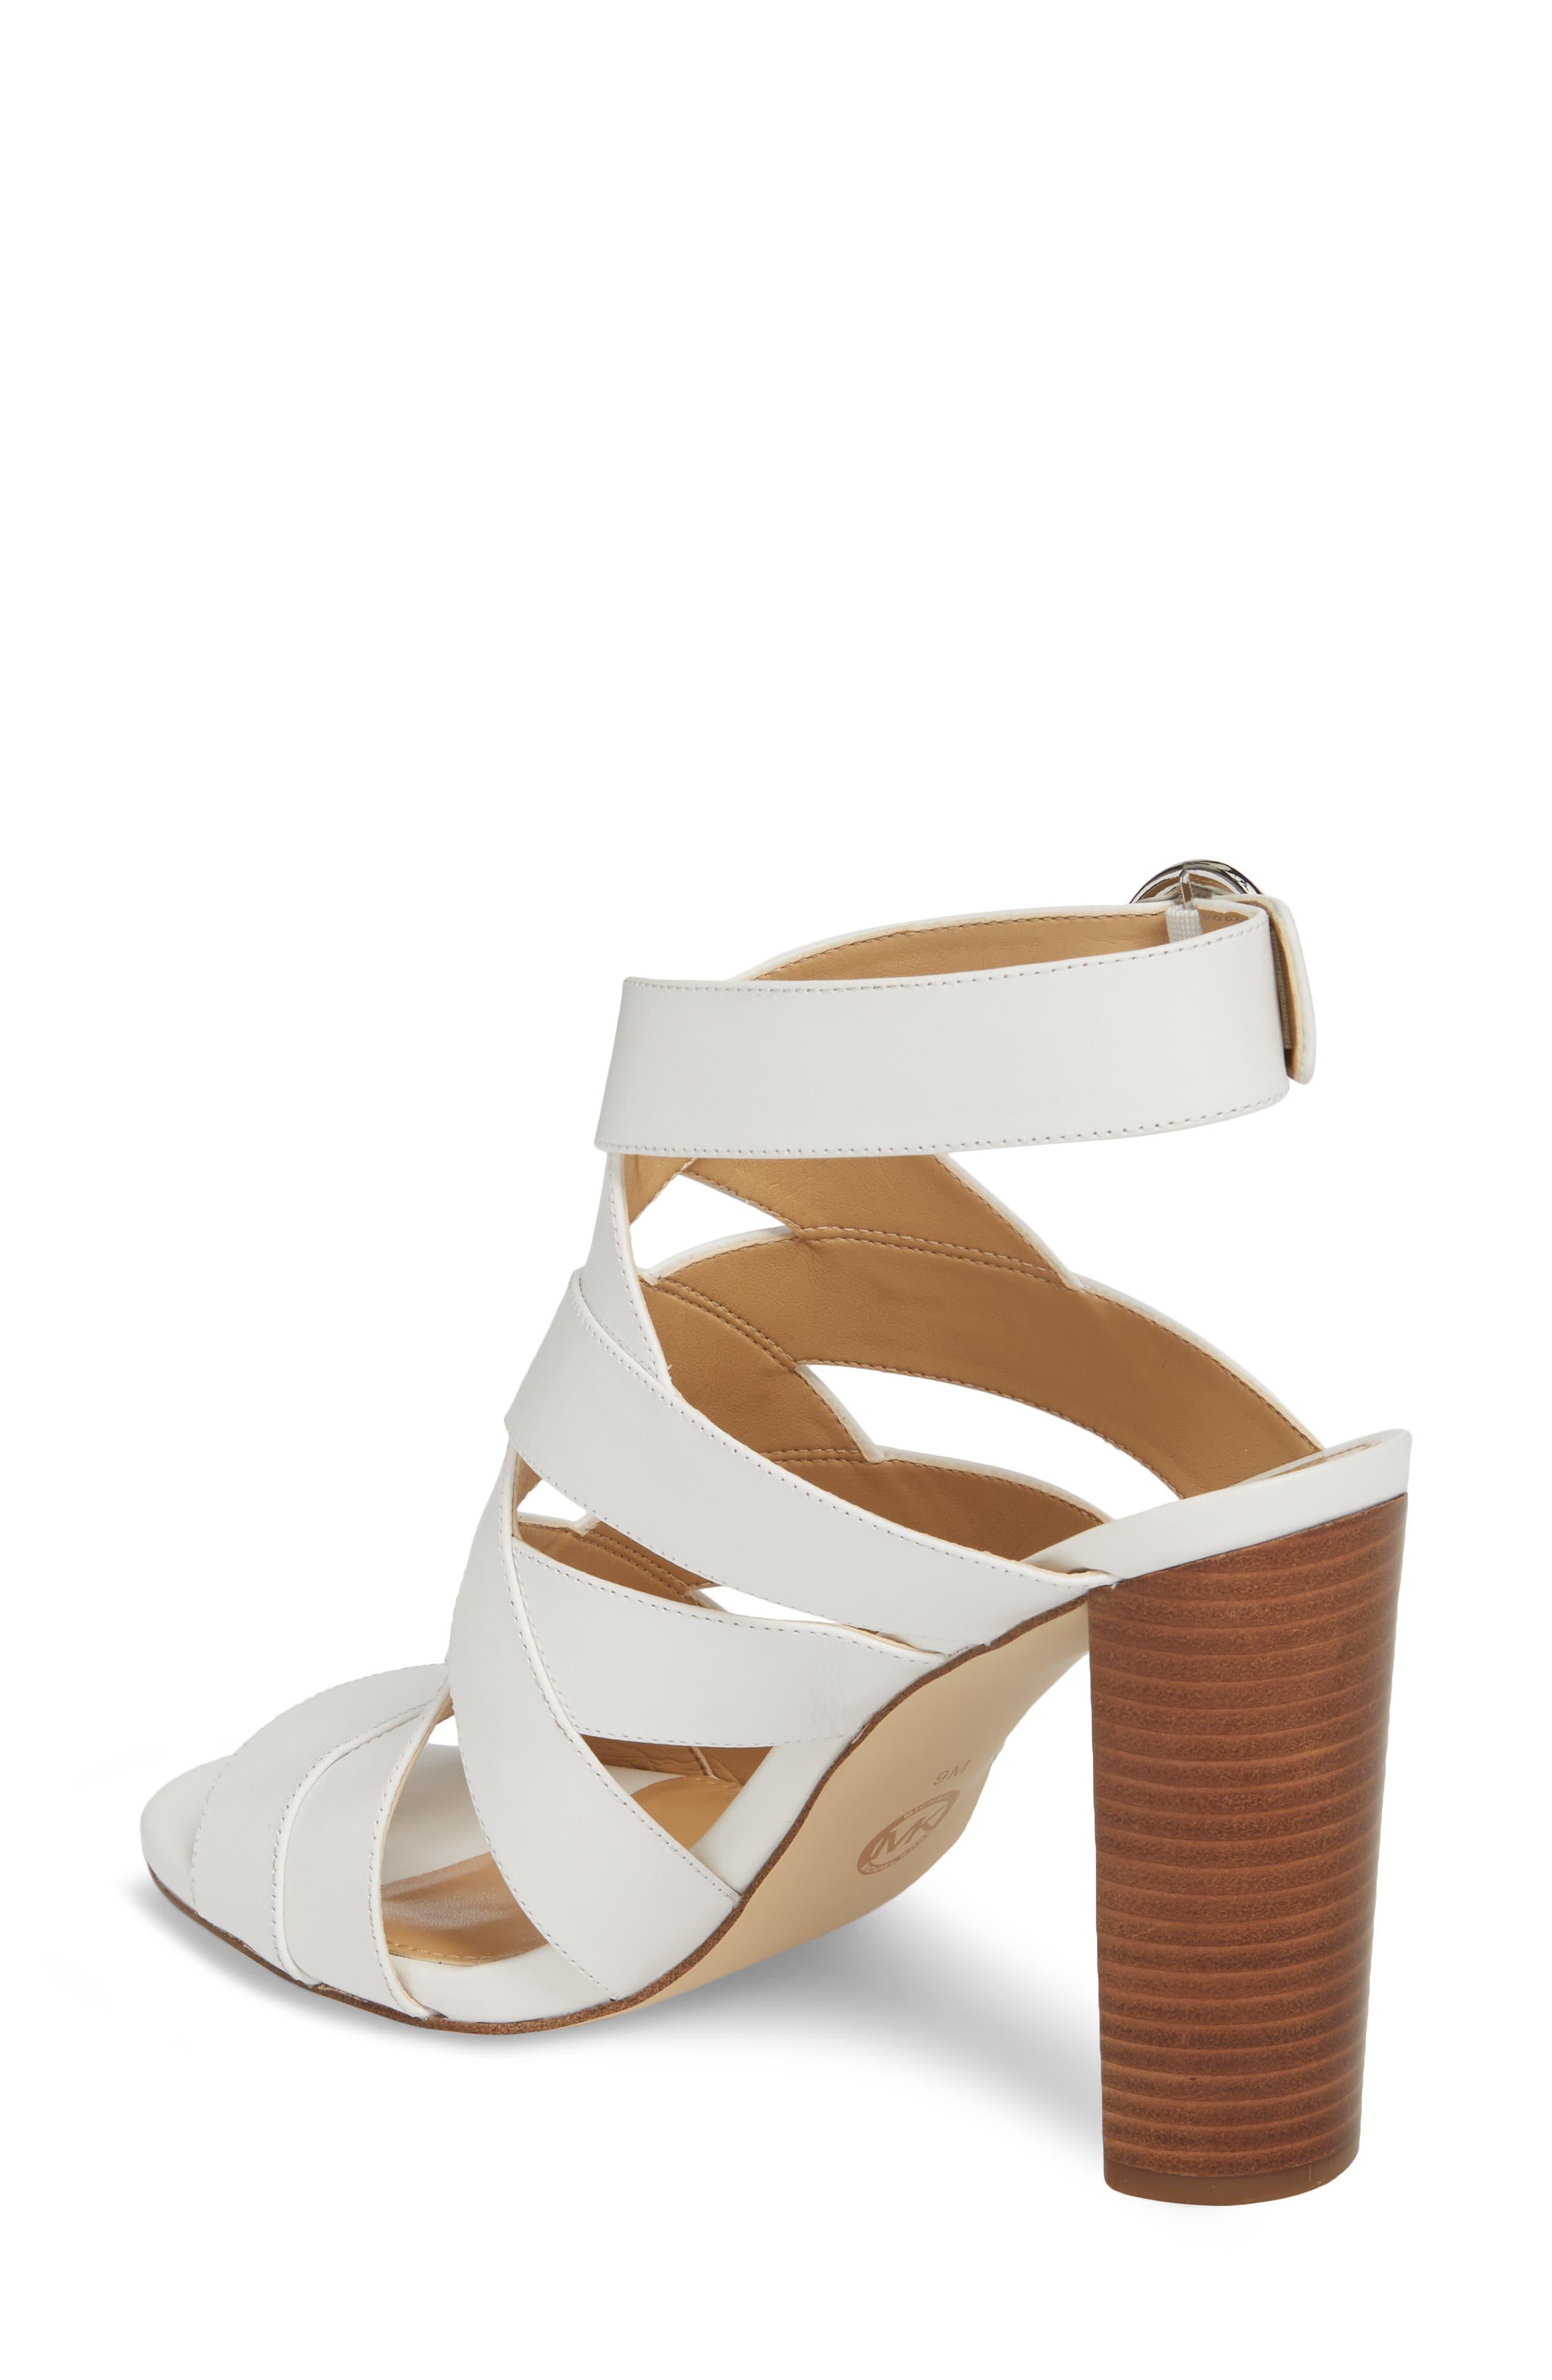 Alana Sandal,                             Alternate thumbnail 2, color,                             Optic White Leather